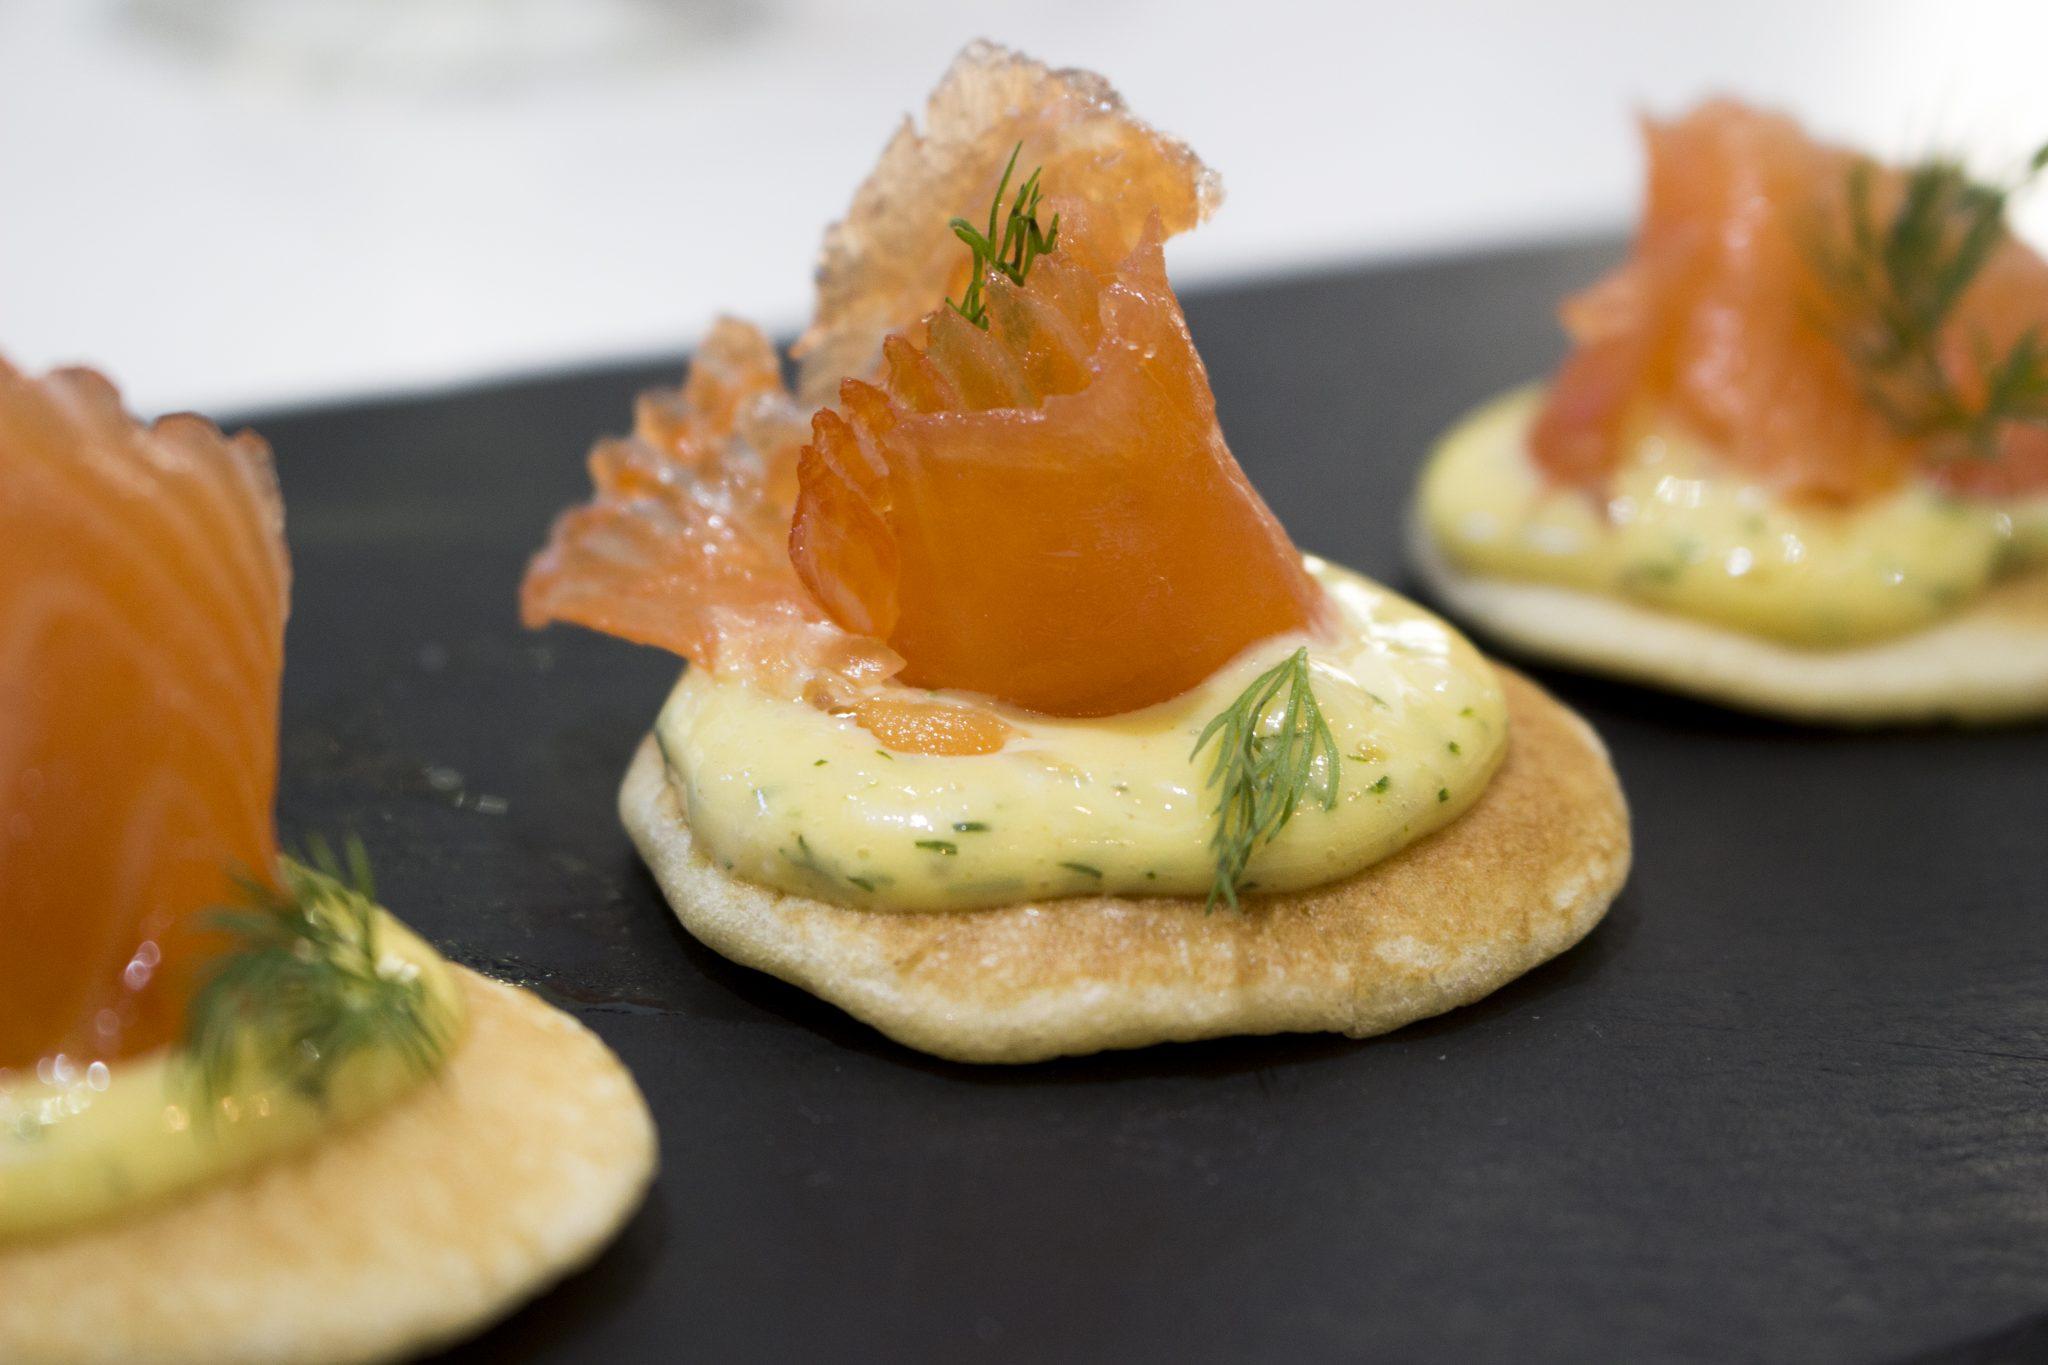 Curso de técnicas básicas de la Escuela de cocina TELVA - Programa - Salmon marinado con blinis